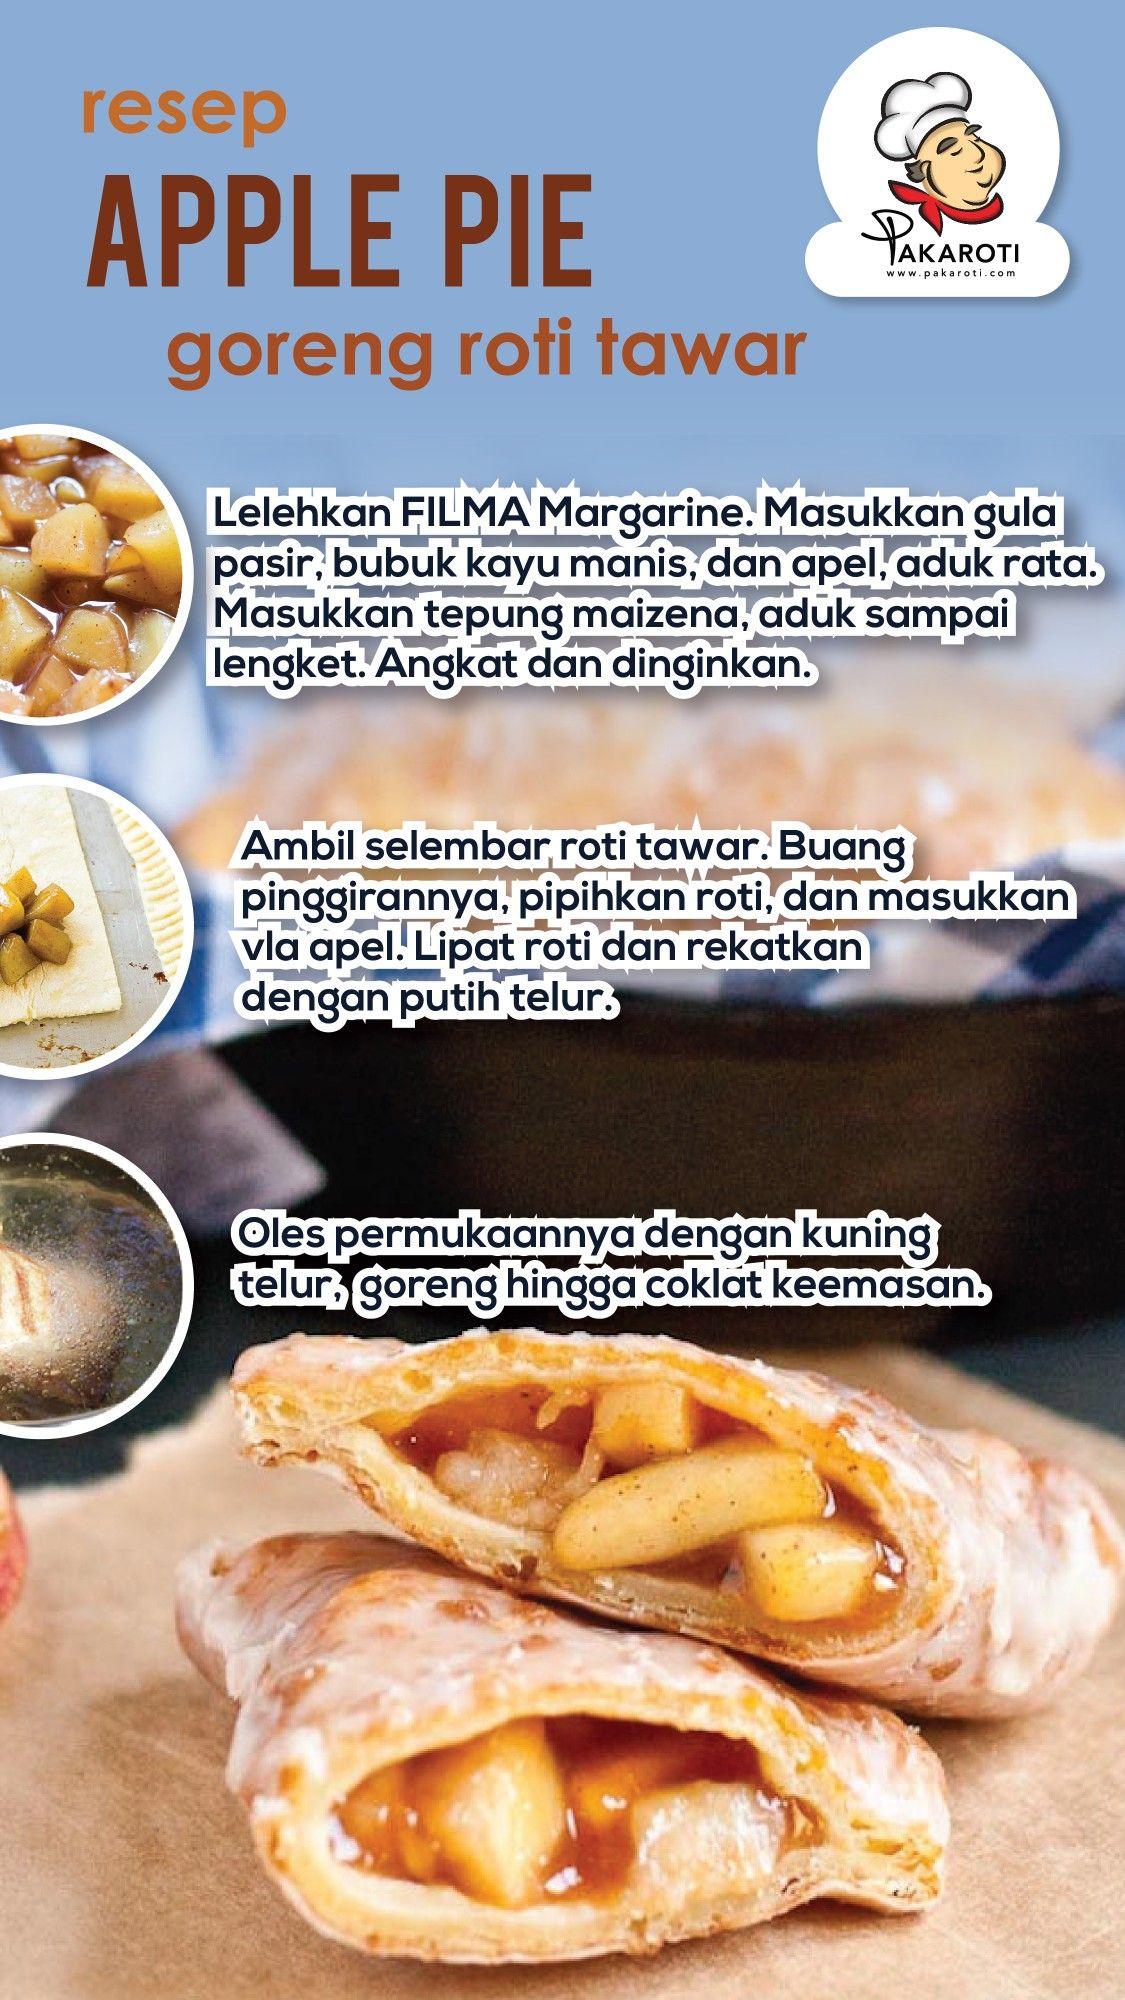 Resep Apple Pie Goreng Roti Tawar Resep Masakan Natal Ide Makanan Resep Makanan